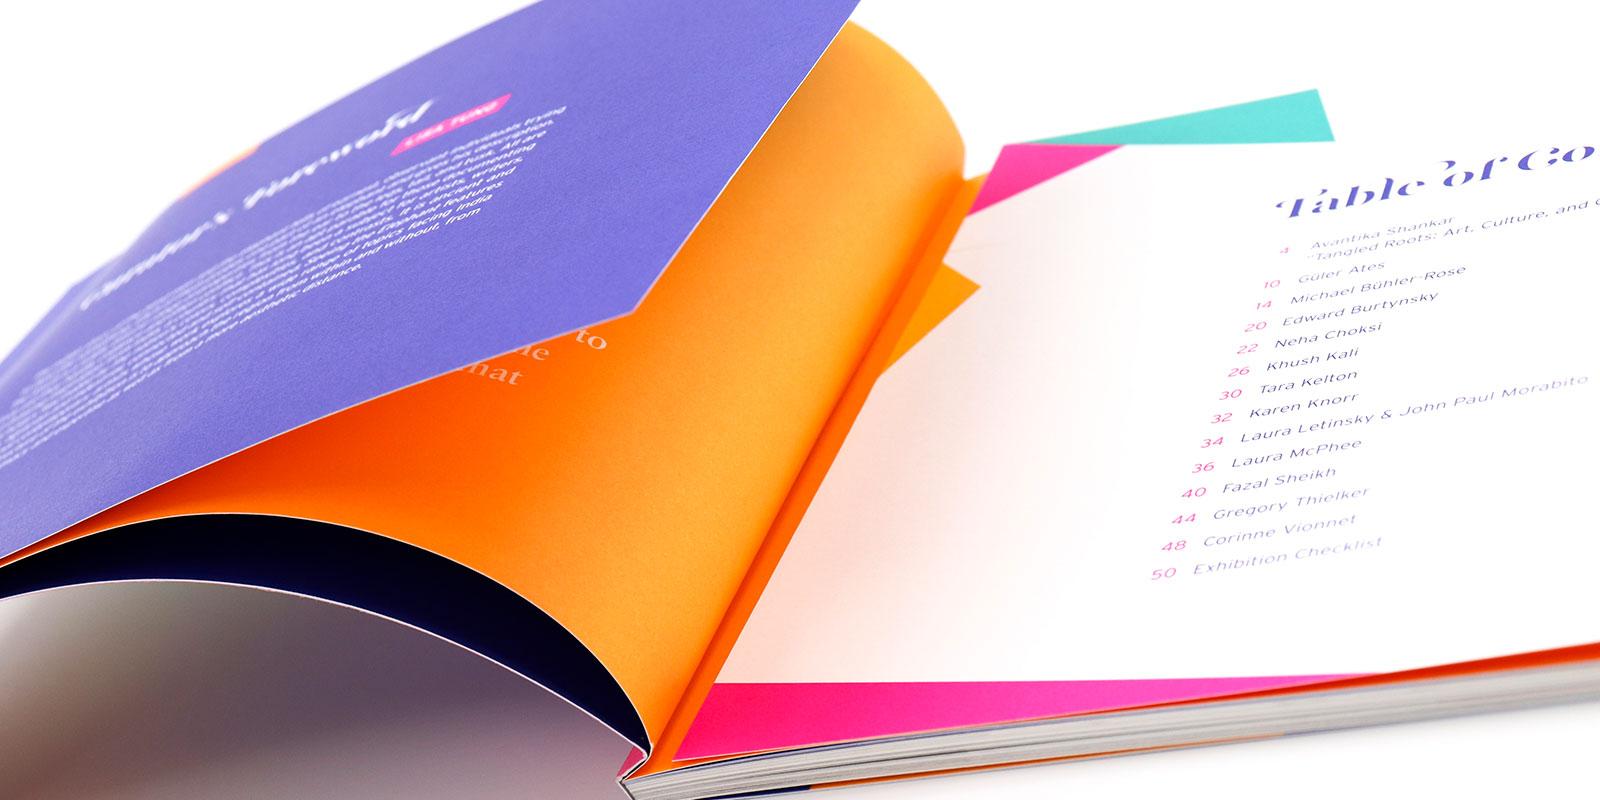 MassArt Exhibition Catalog Seeing the Elephant - Print Design